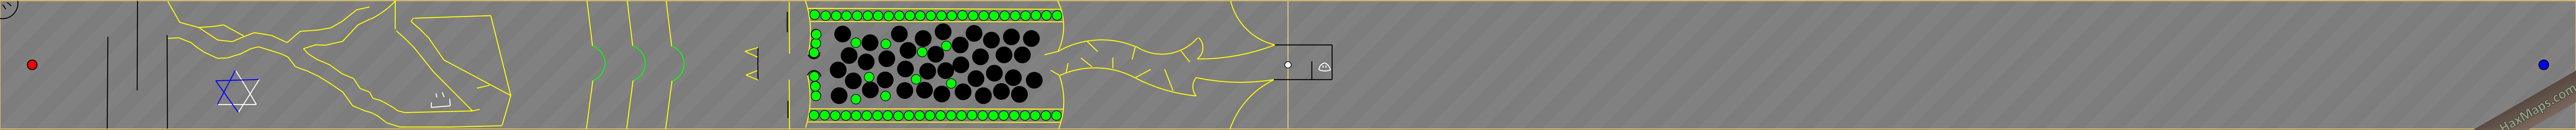 hax ball maps | Yellow Normal